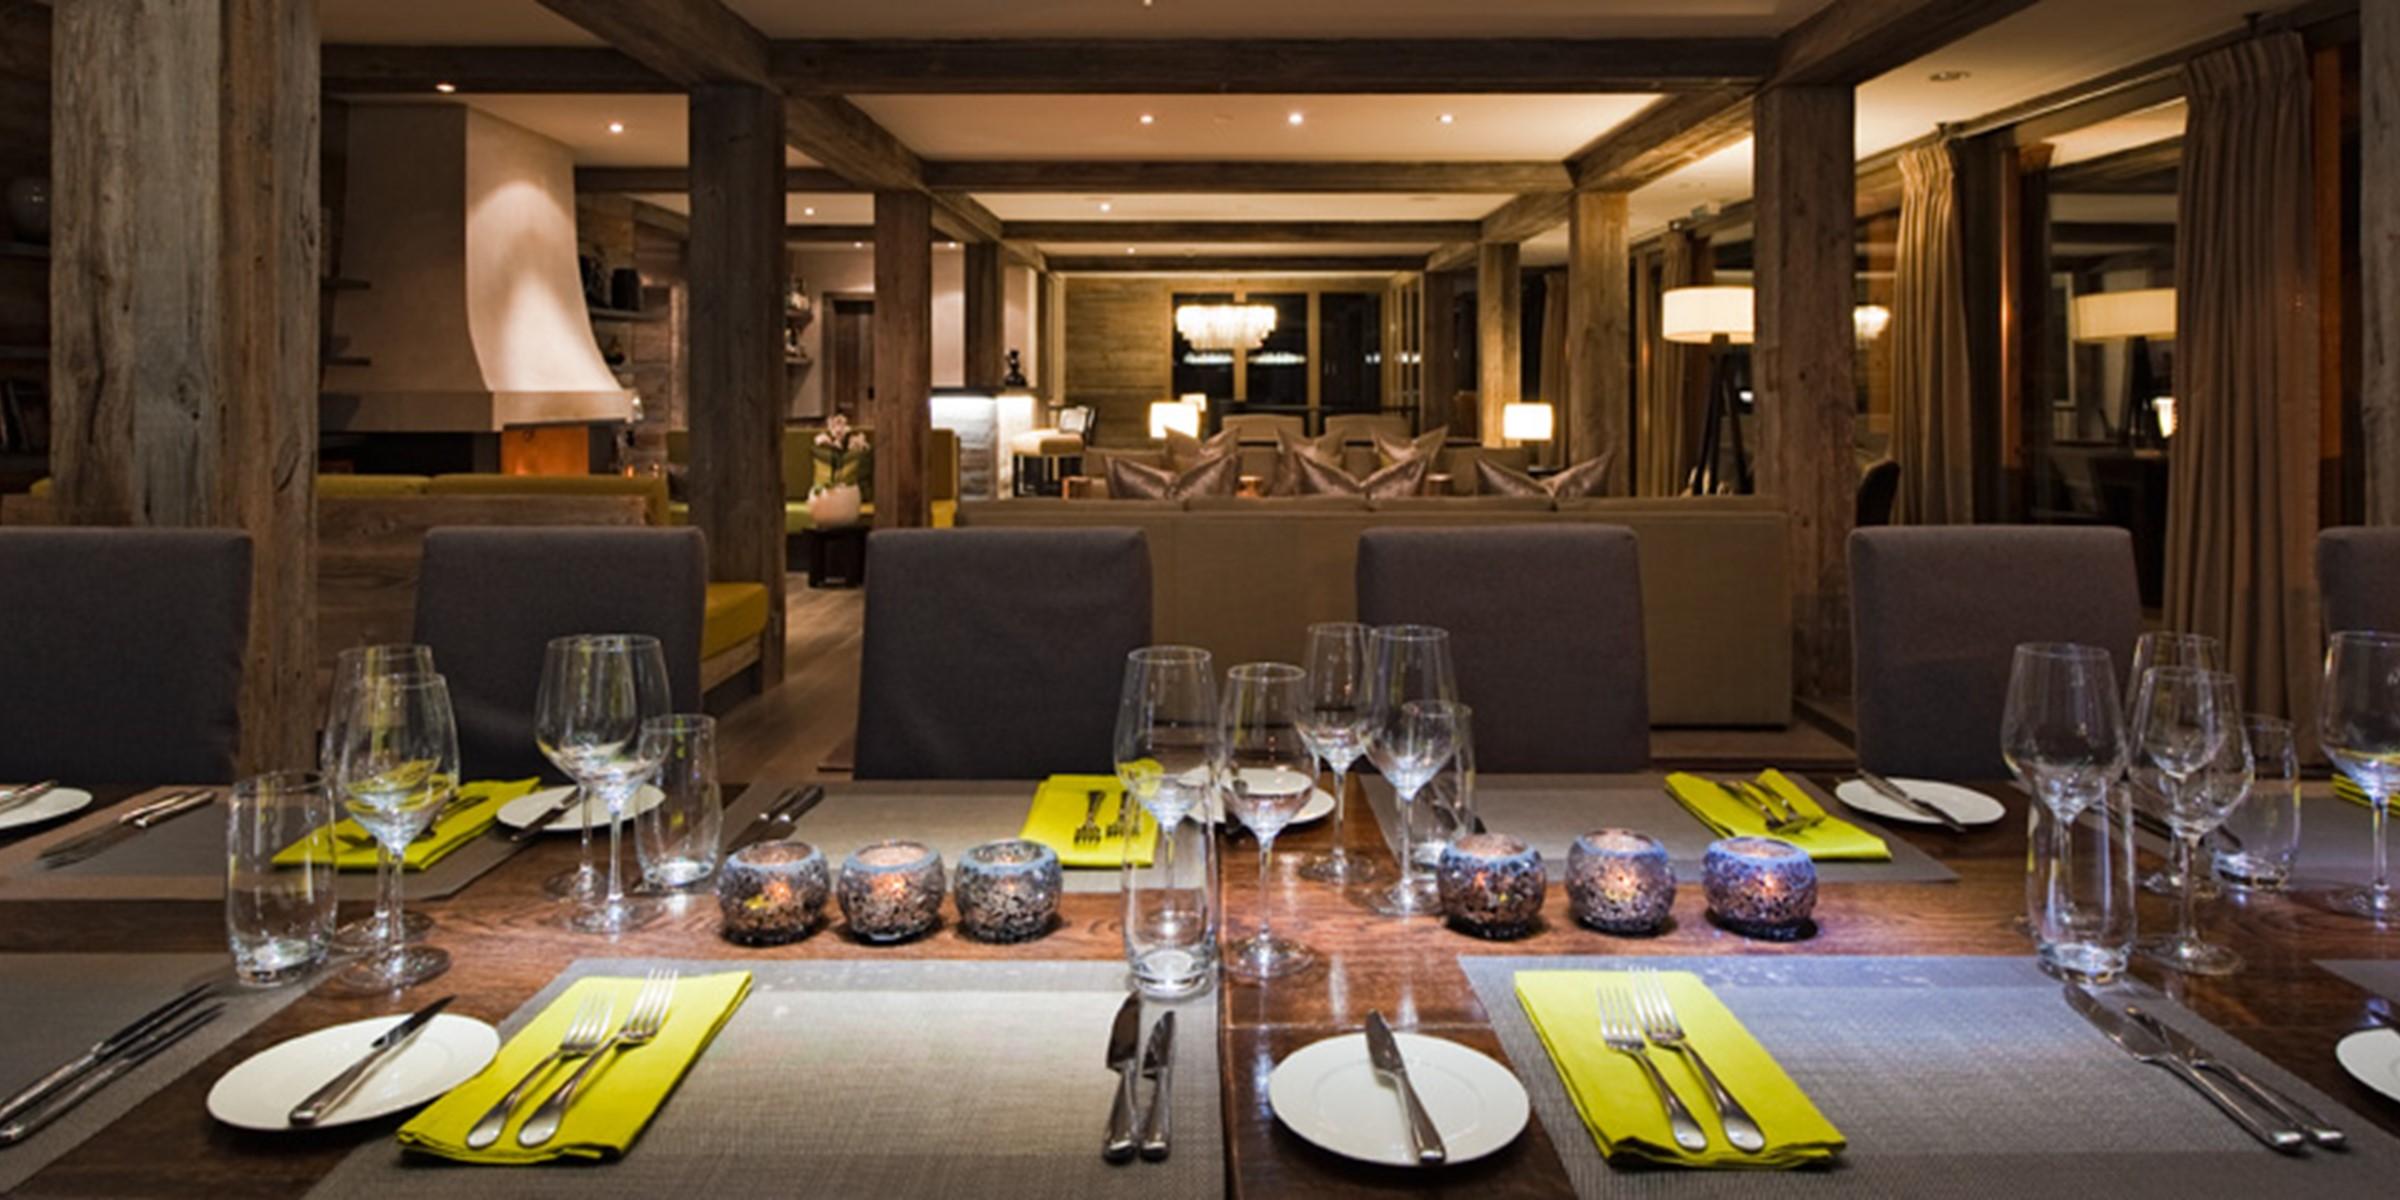 Lodge Diningsetup 000